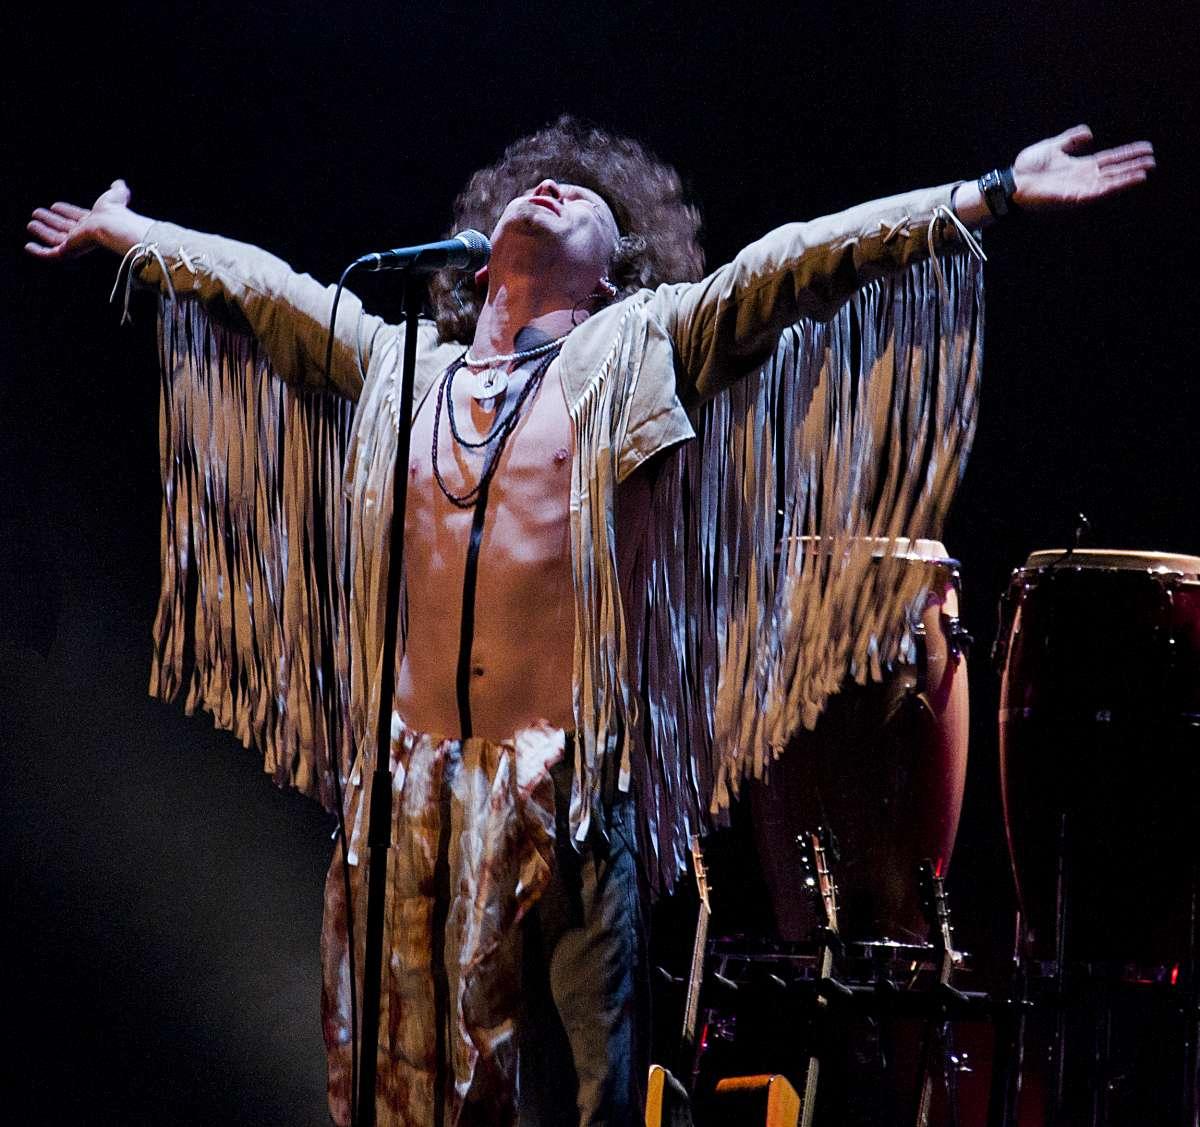 Ww presents: Woodstock: Das Rockmusical - 50th Anniversary Tour - Paderhalle - Paderborn